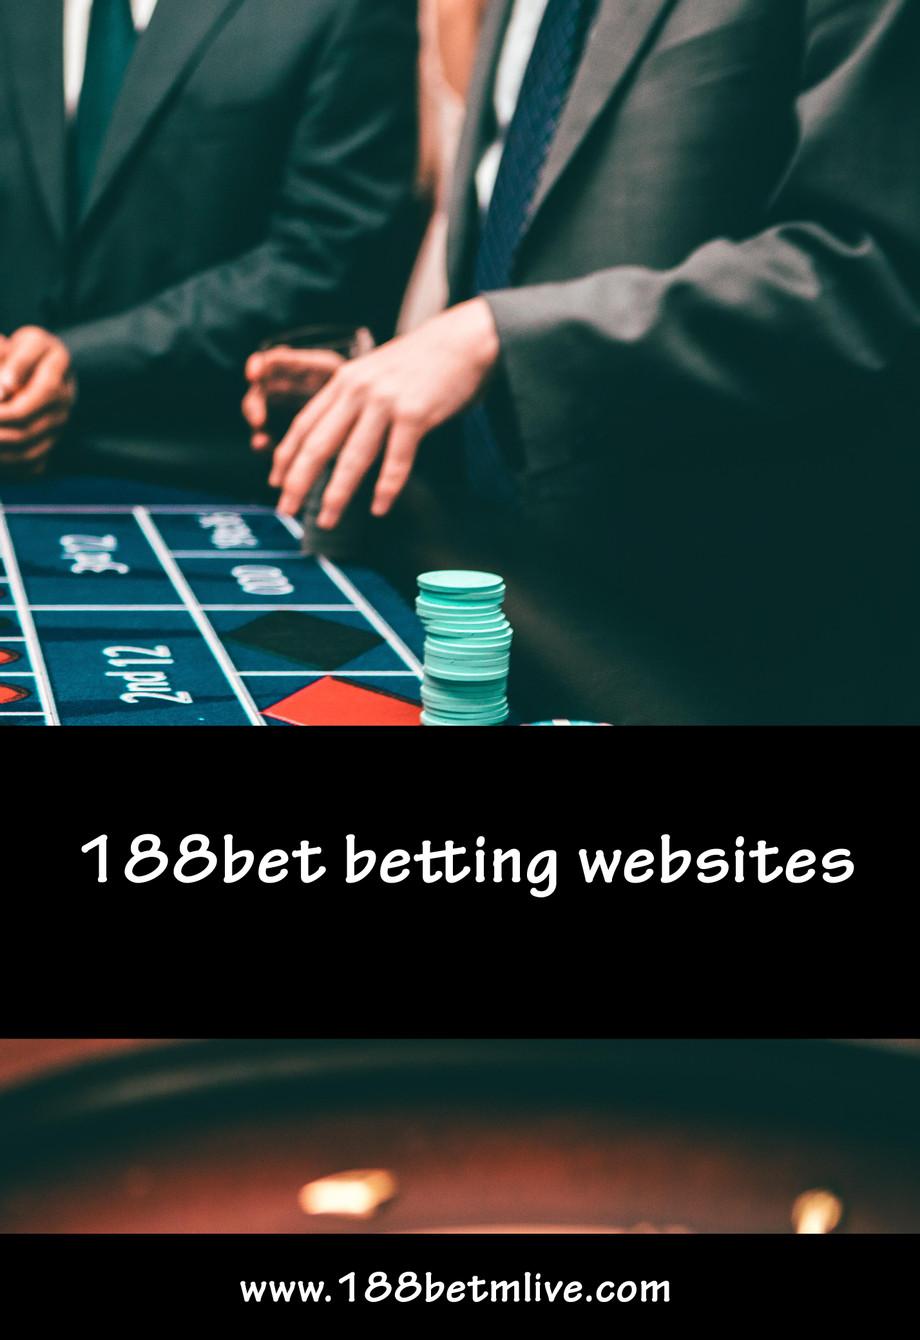 188betbettingwebsites.jpg